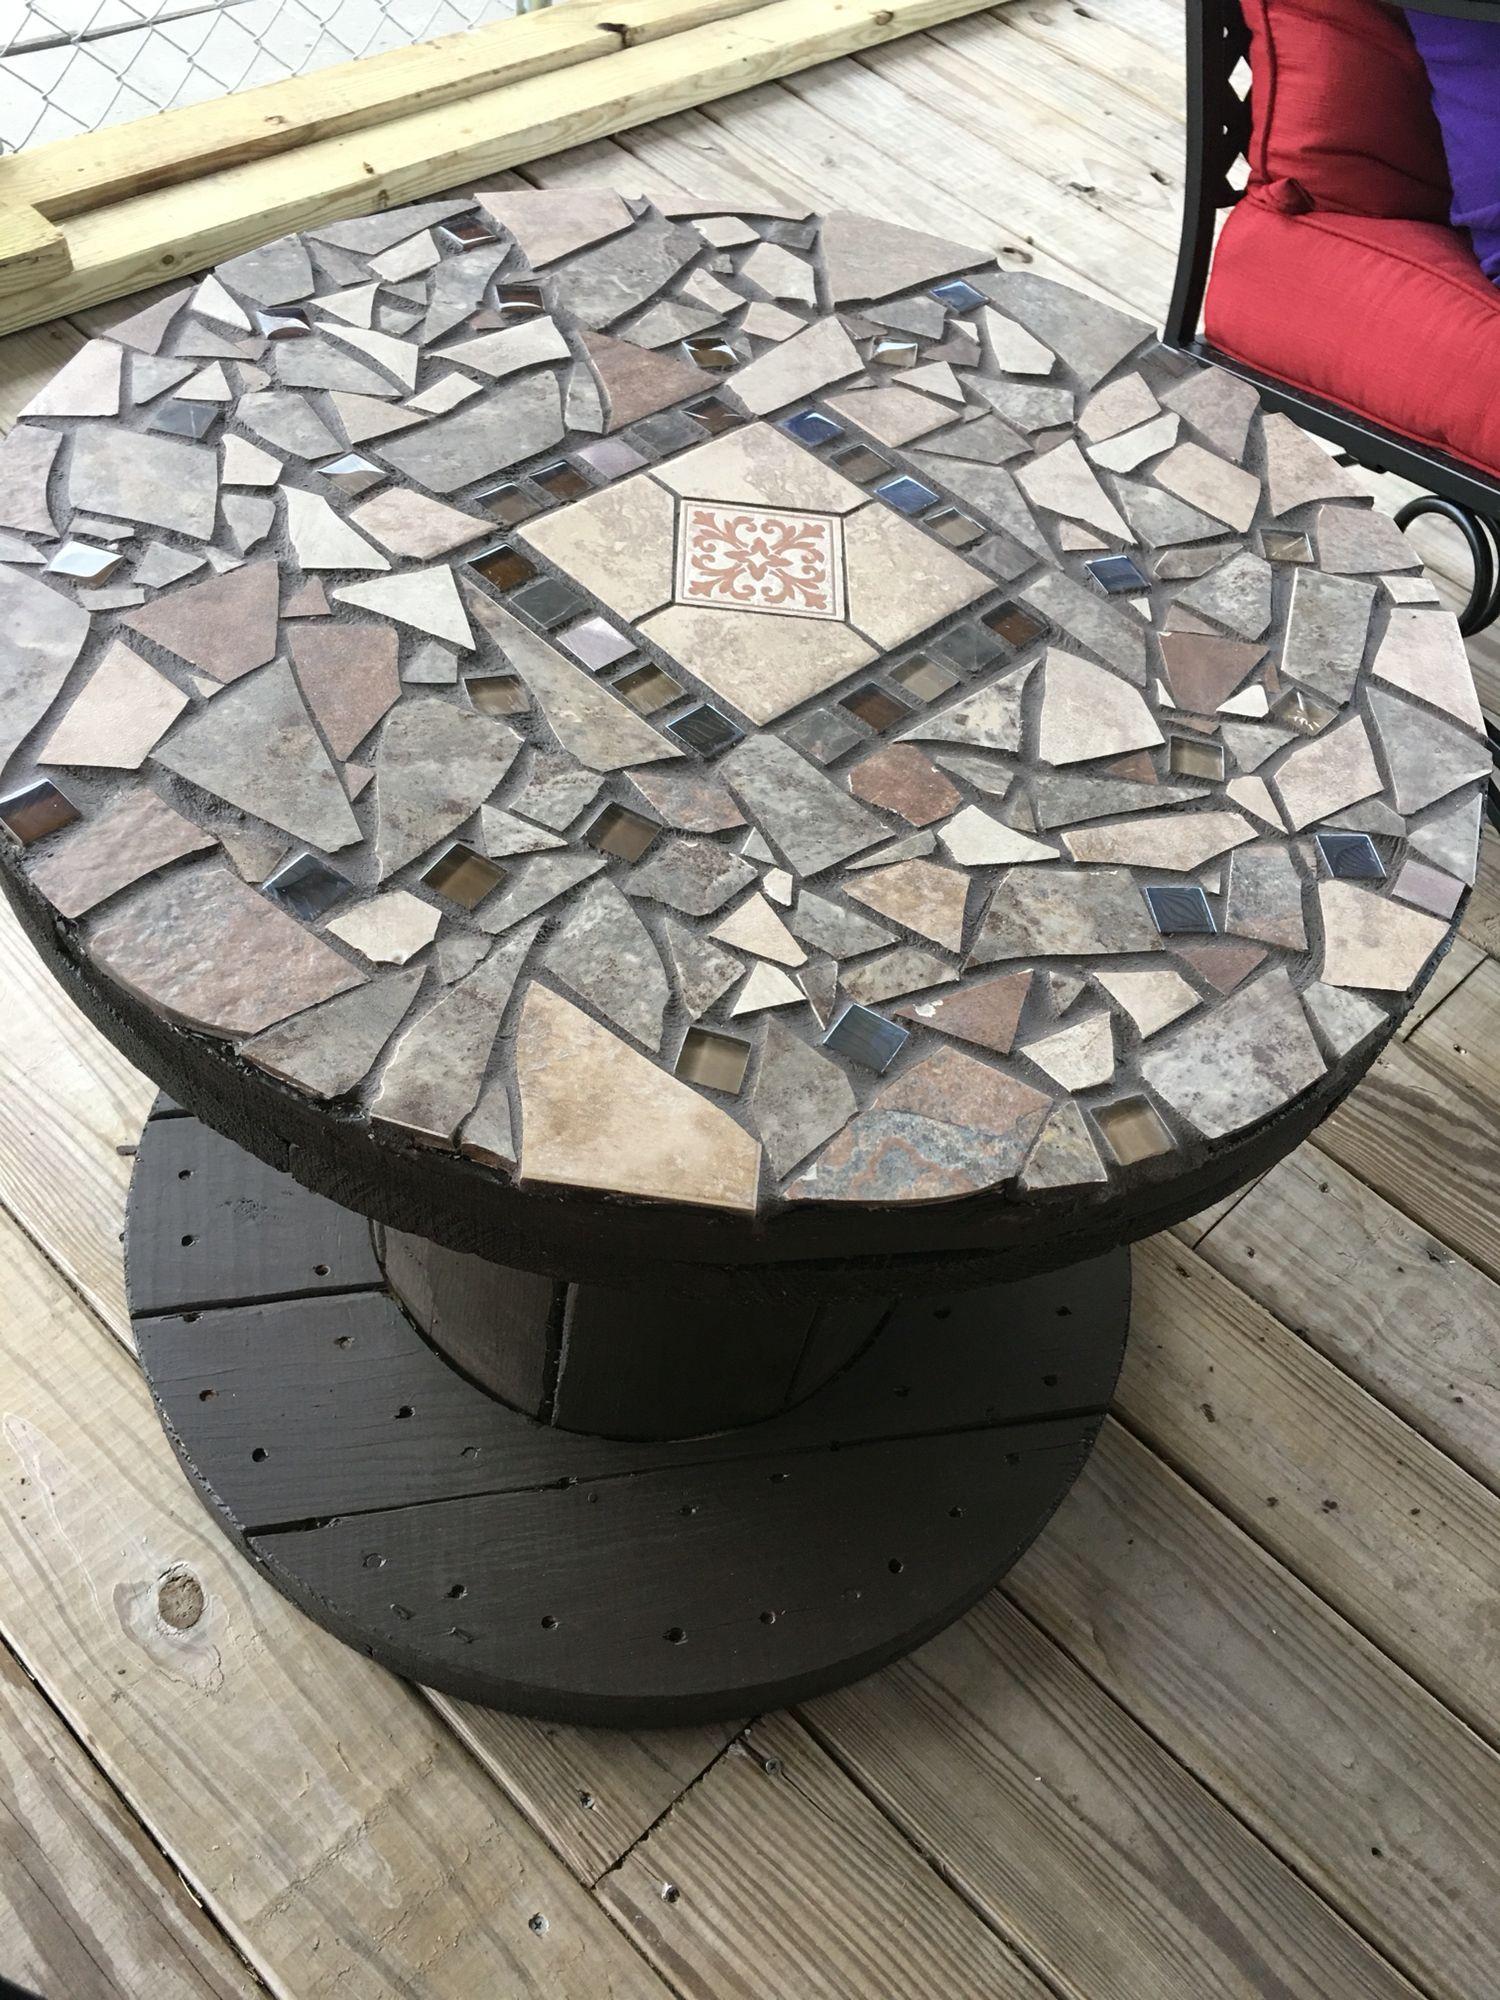 my table i made from a wooden spool and broken tiles backyard pinterest kabeltrommel. Black Bedroom Furniture Sets. Home Design Ideas